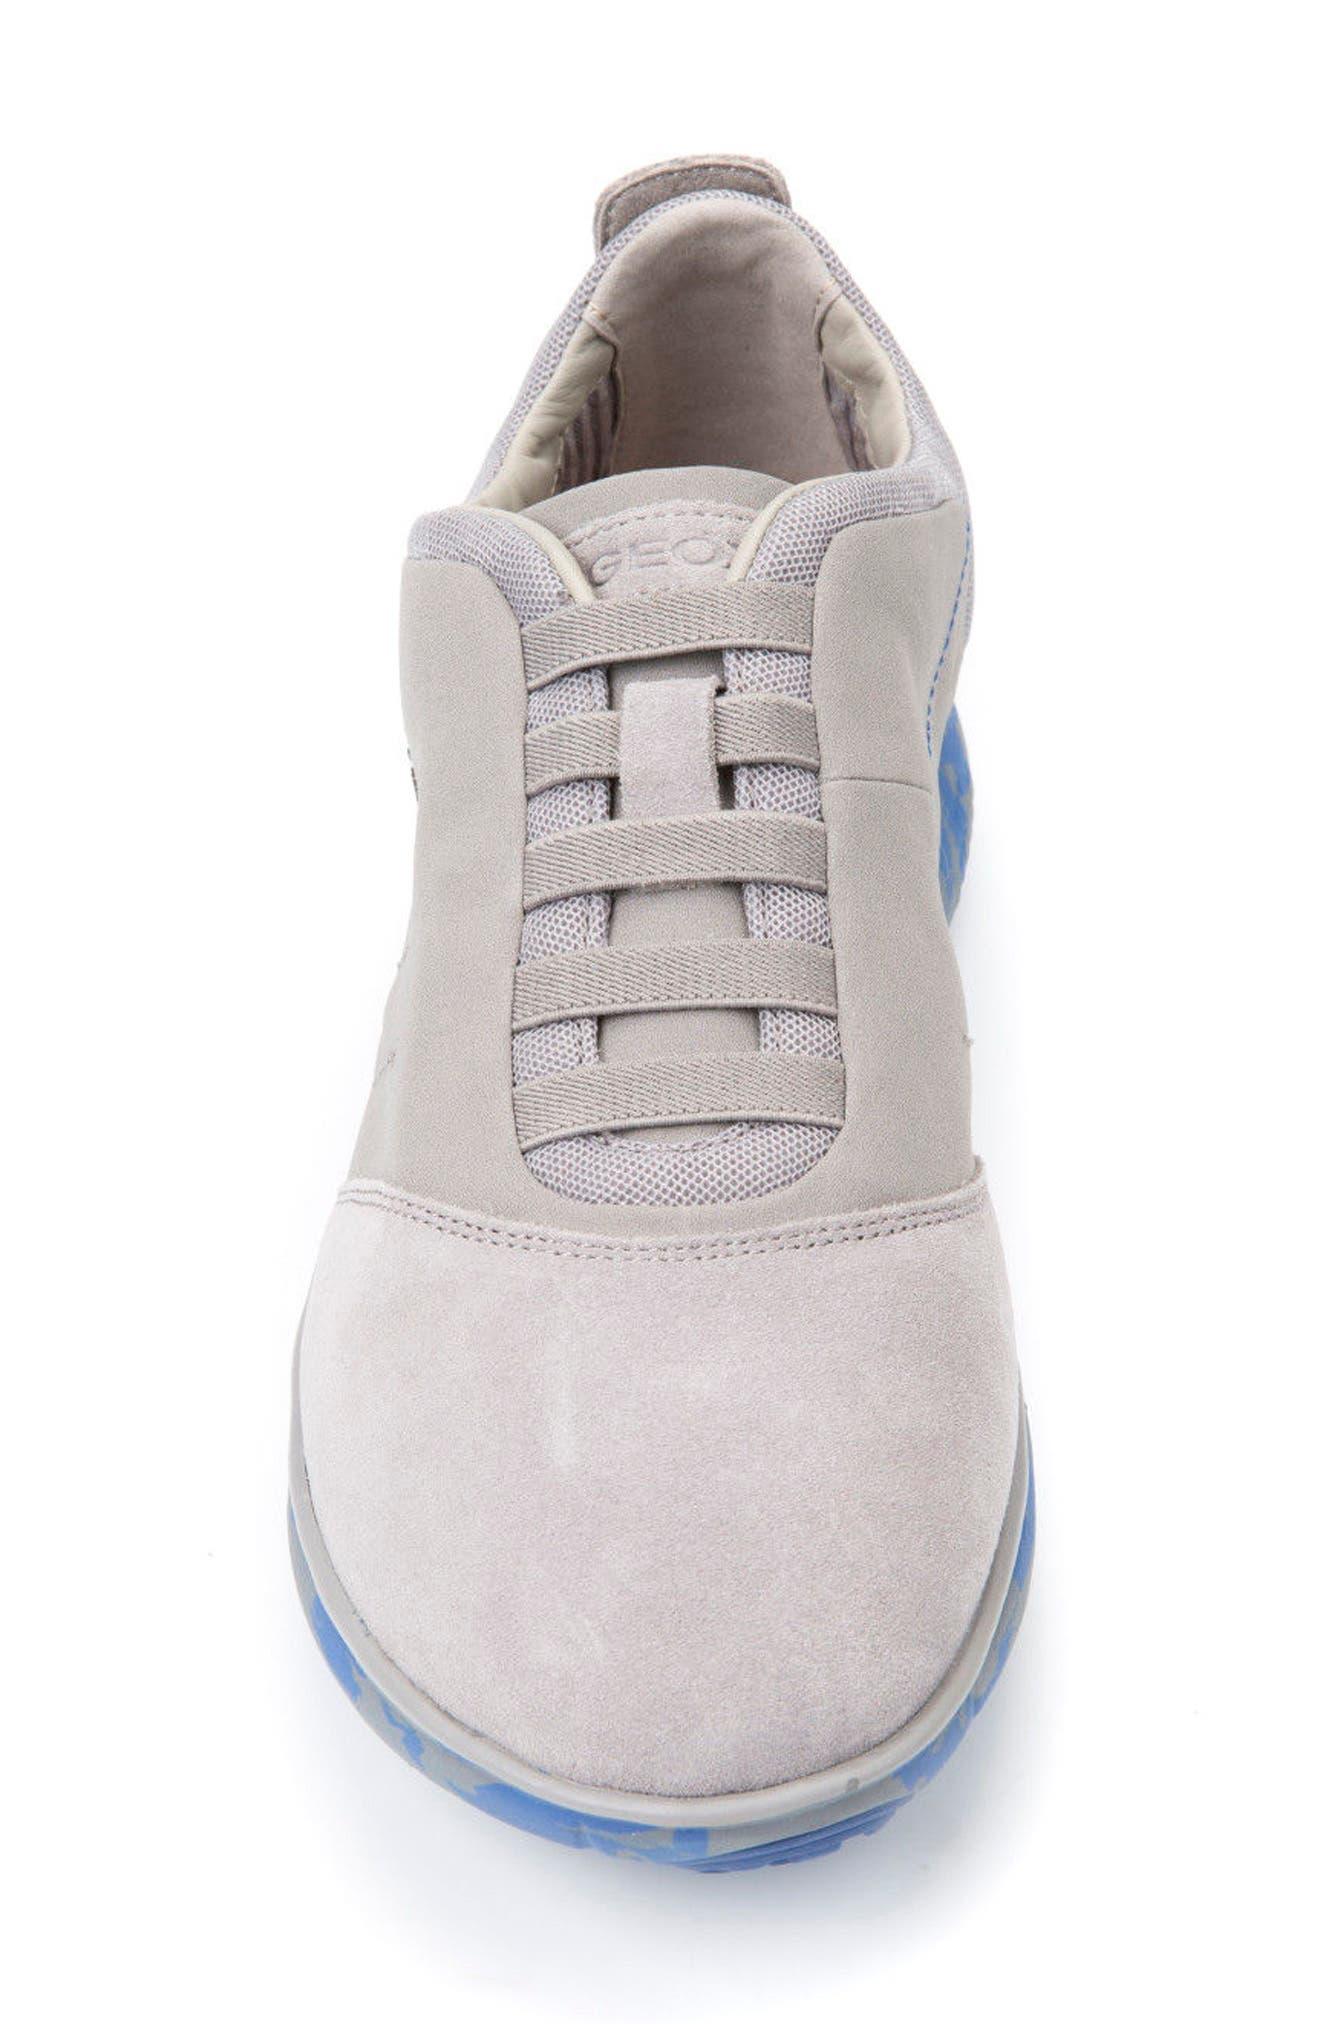 'Nebula 17' Slip-On Sneaker,                             Alternate thumbnail 4, color,                             STONE/ ROYAL